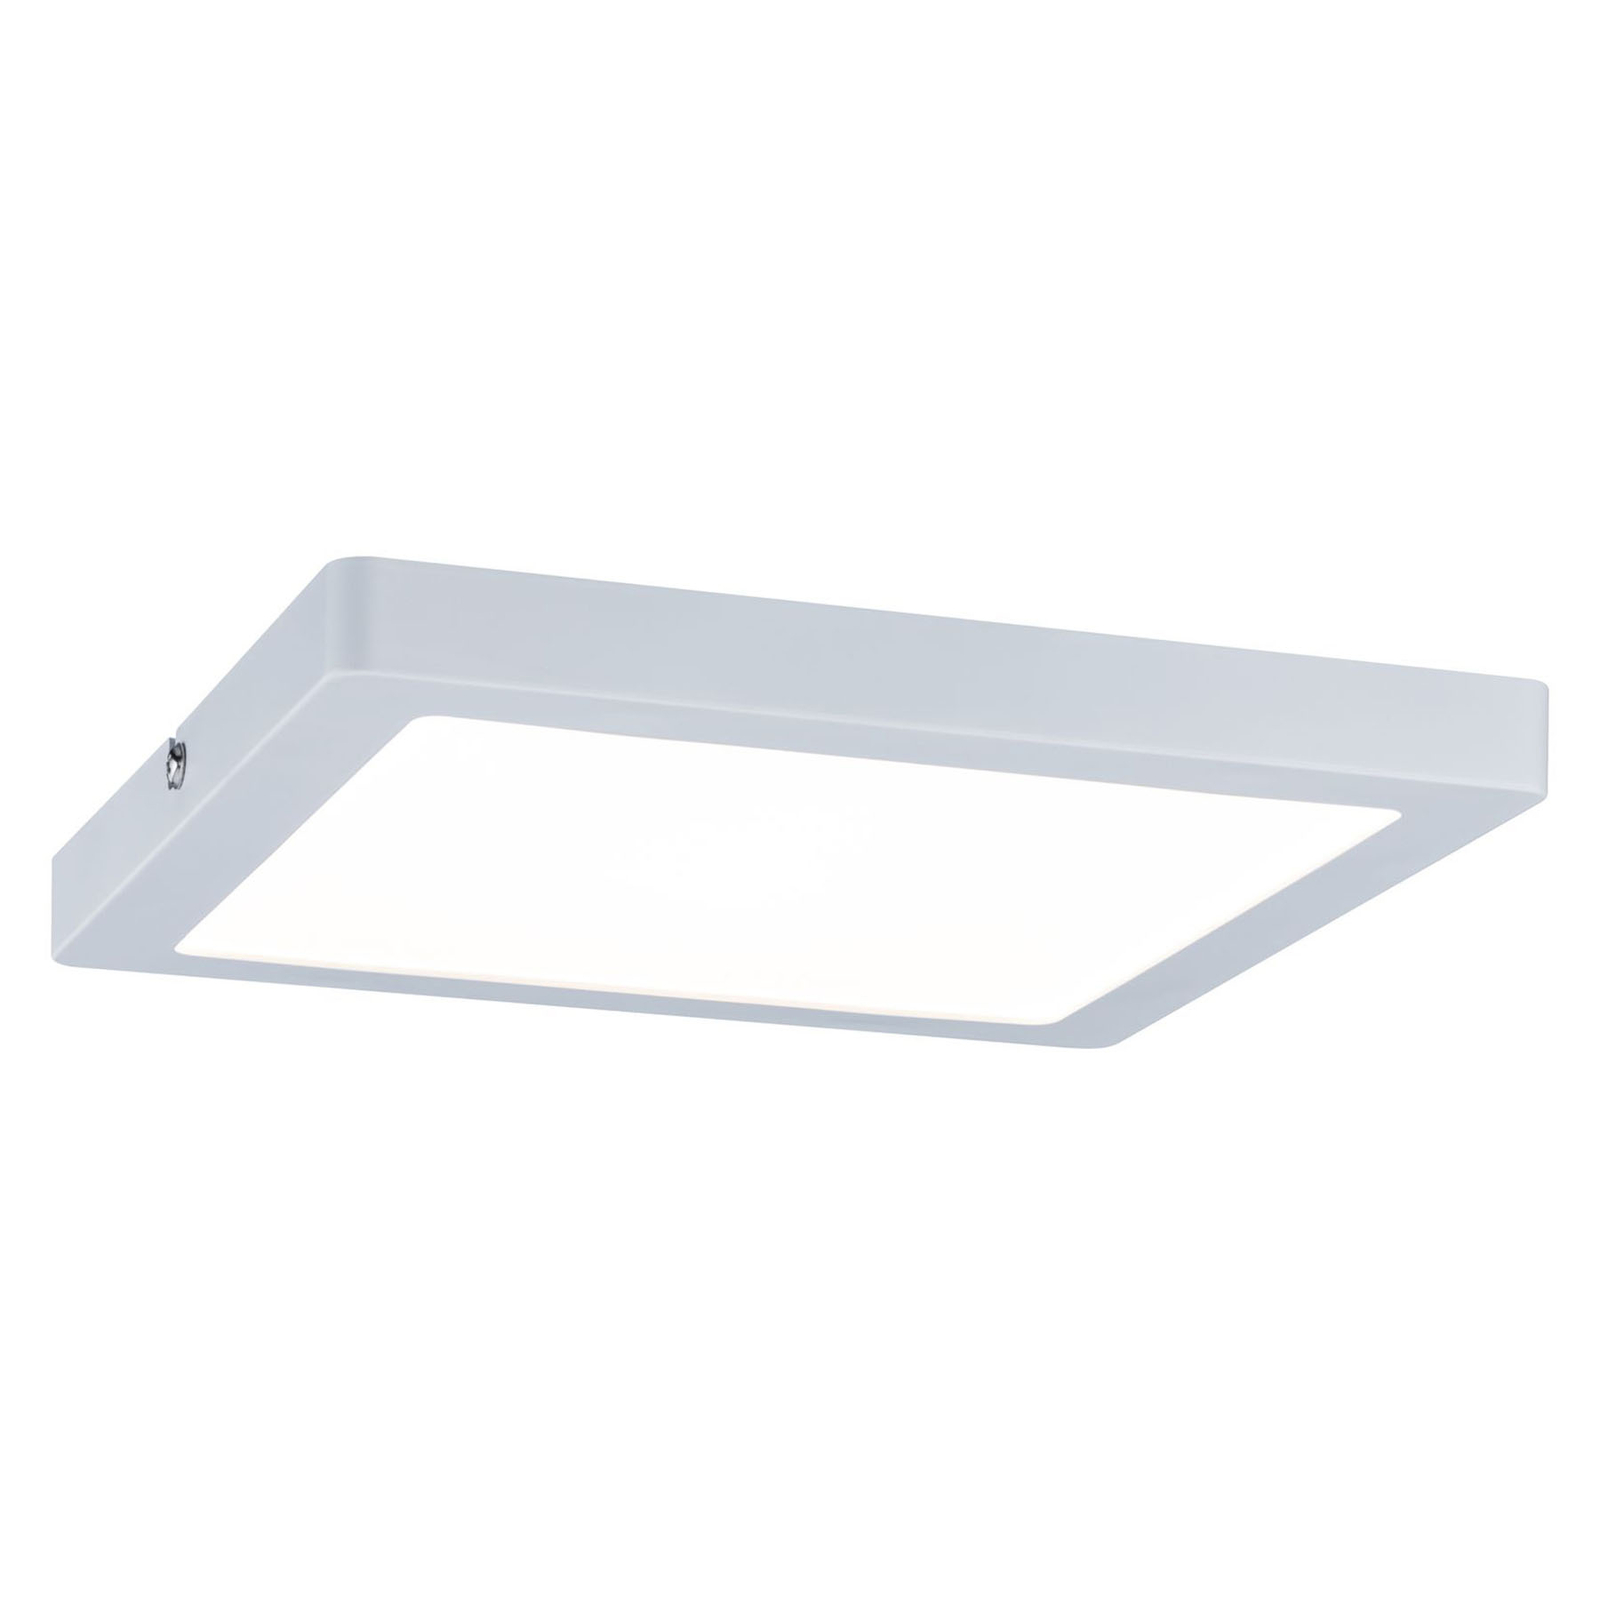 Paulmann Atria LED stropní světlo 22x22 cm bílá